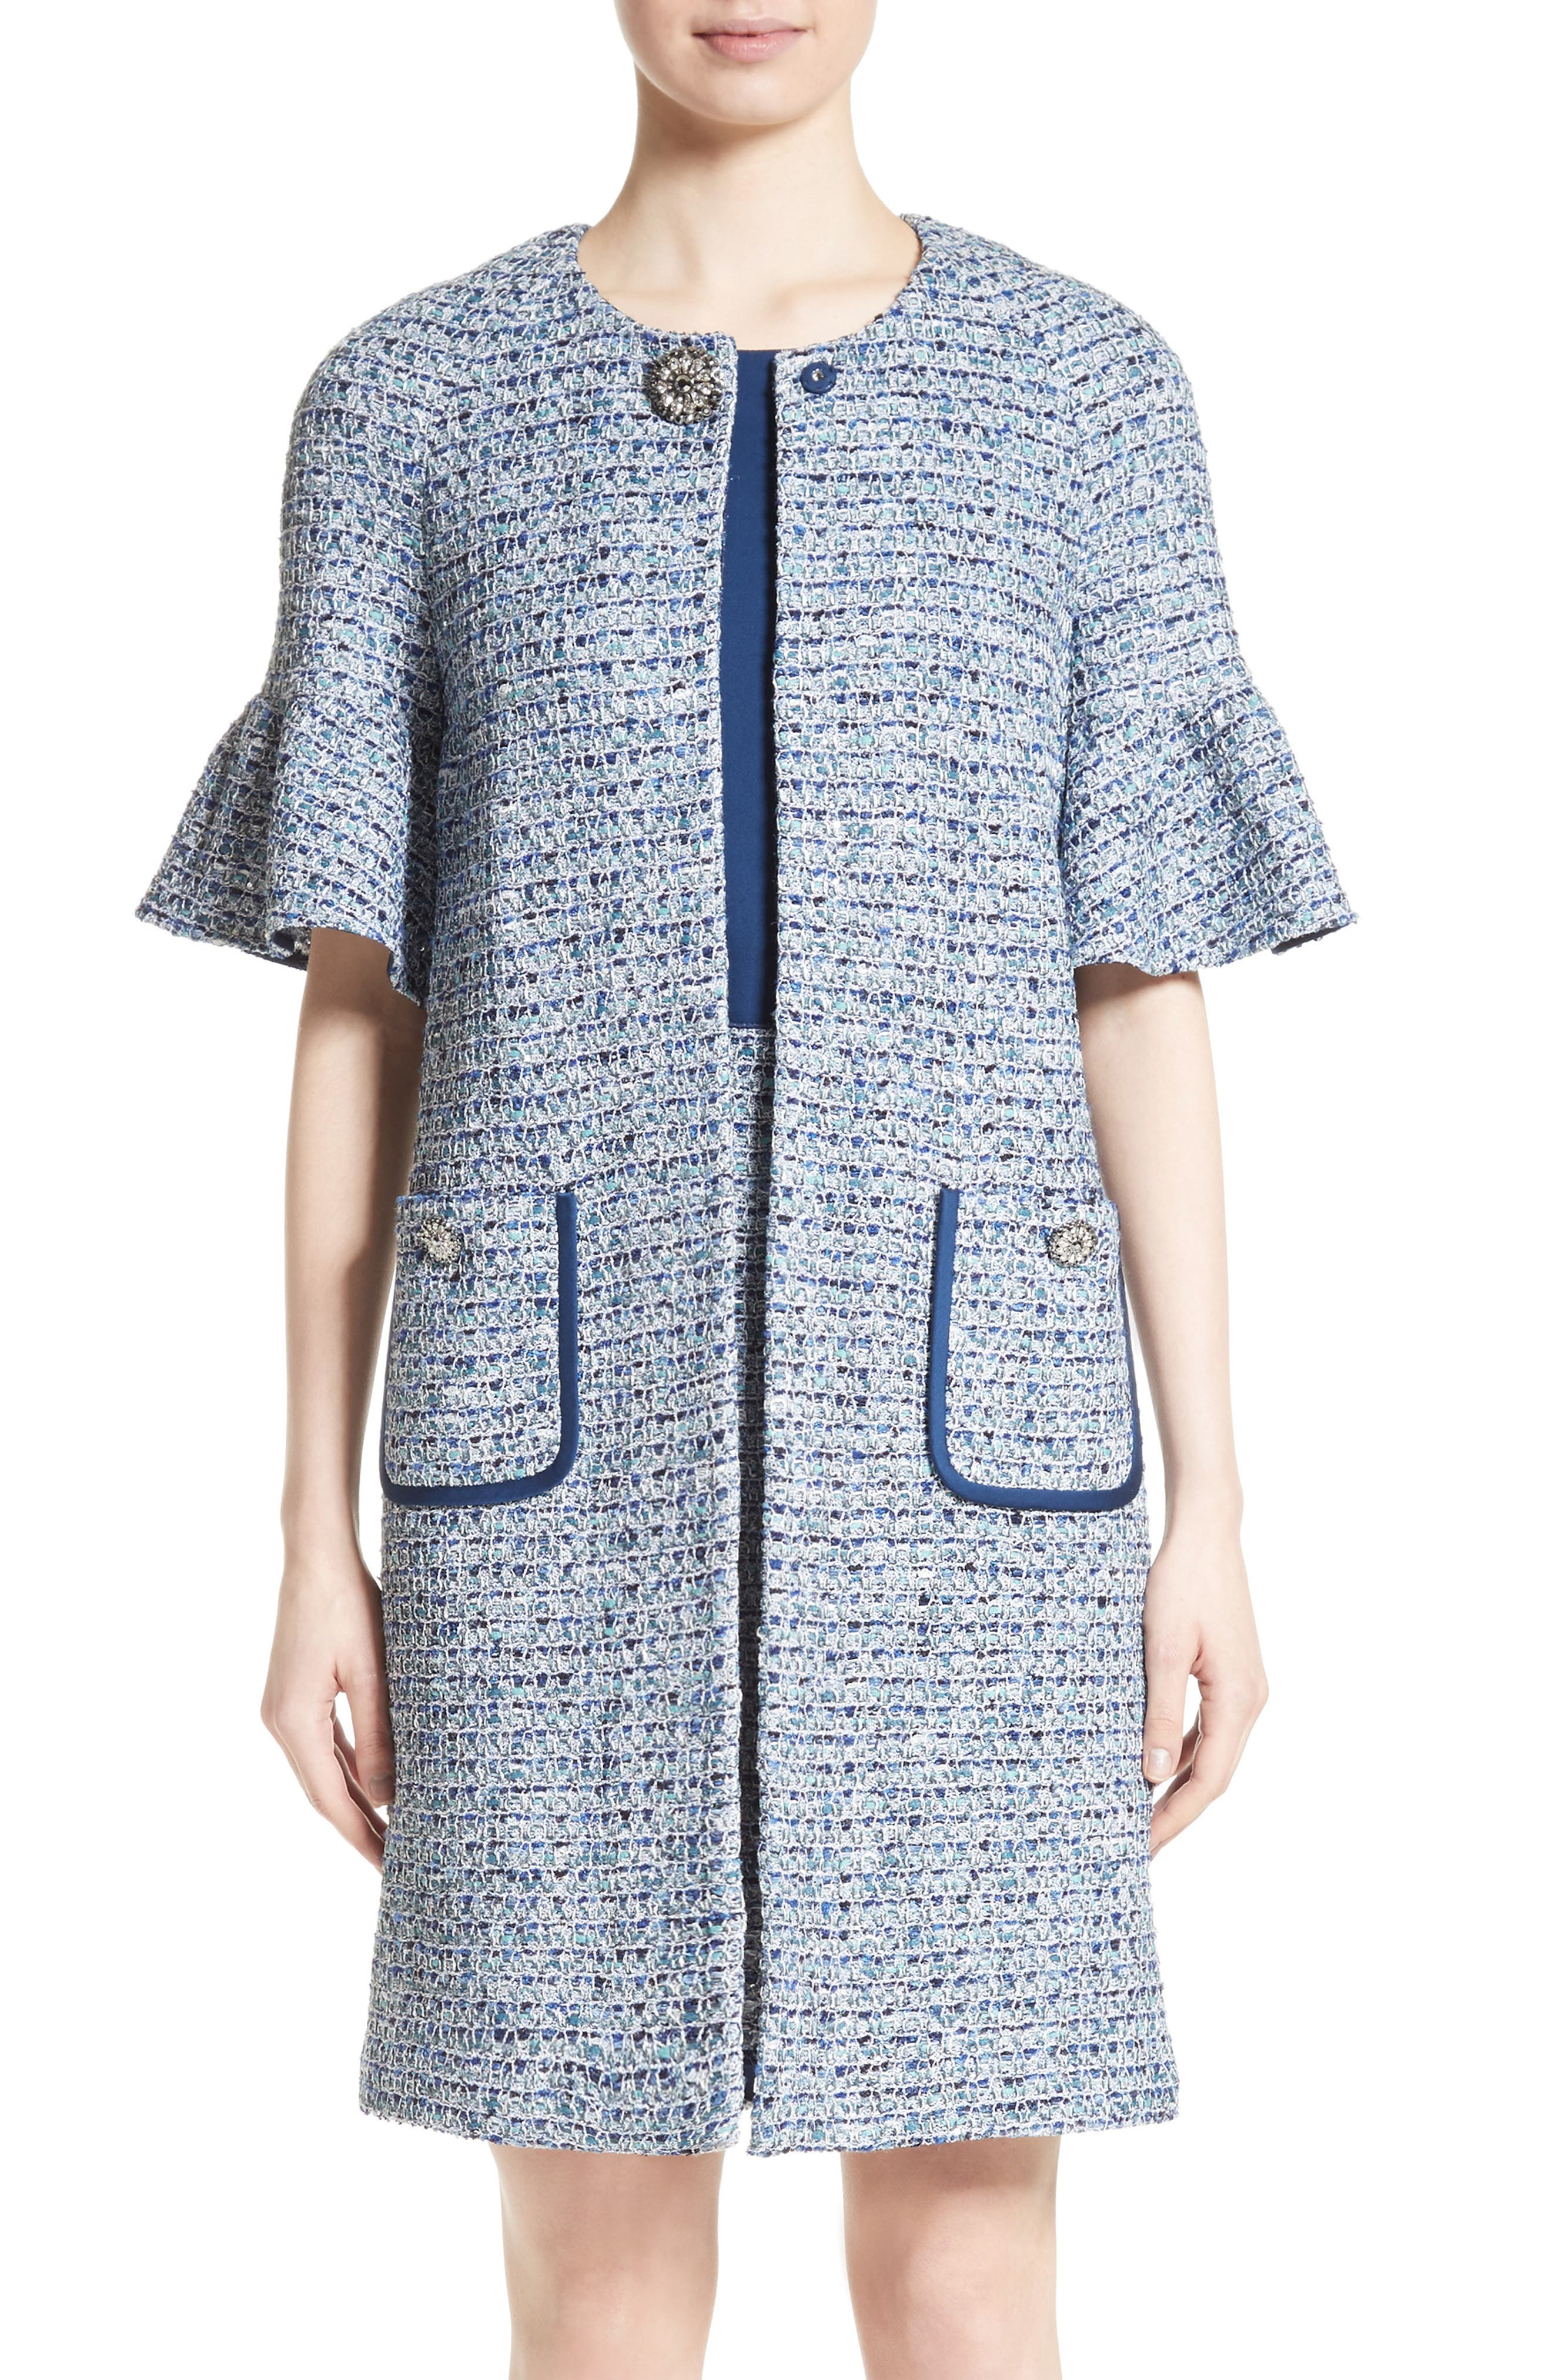 St. John Collection Kiara Tweed Bell Sleeve Jacket